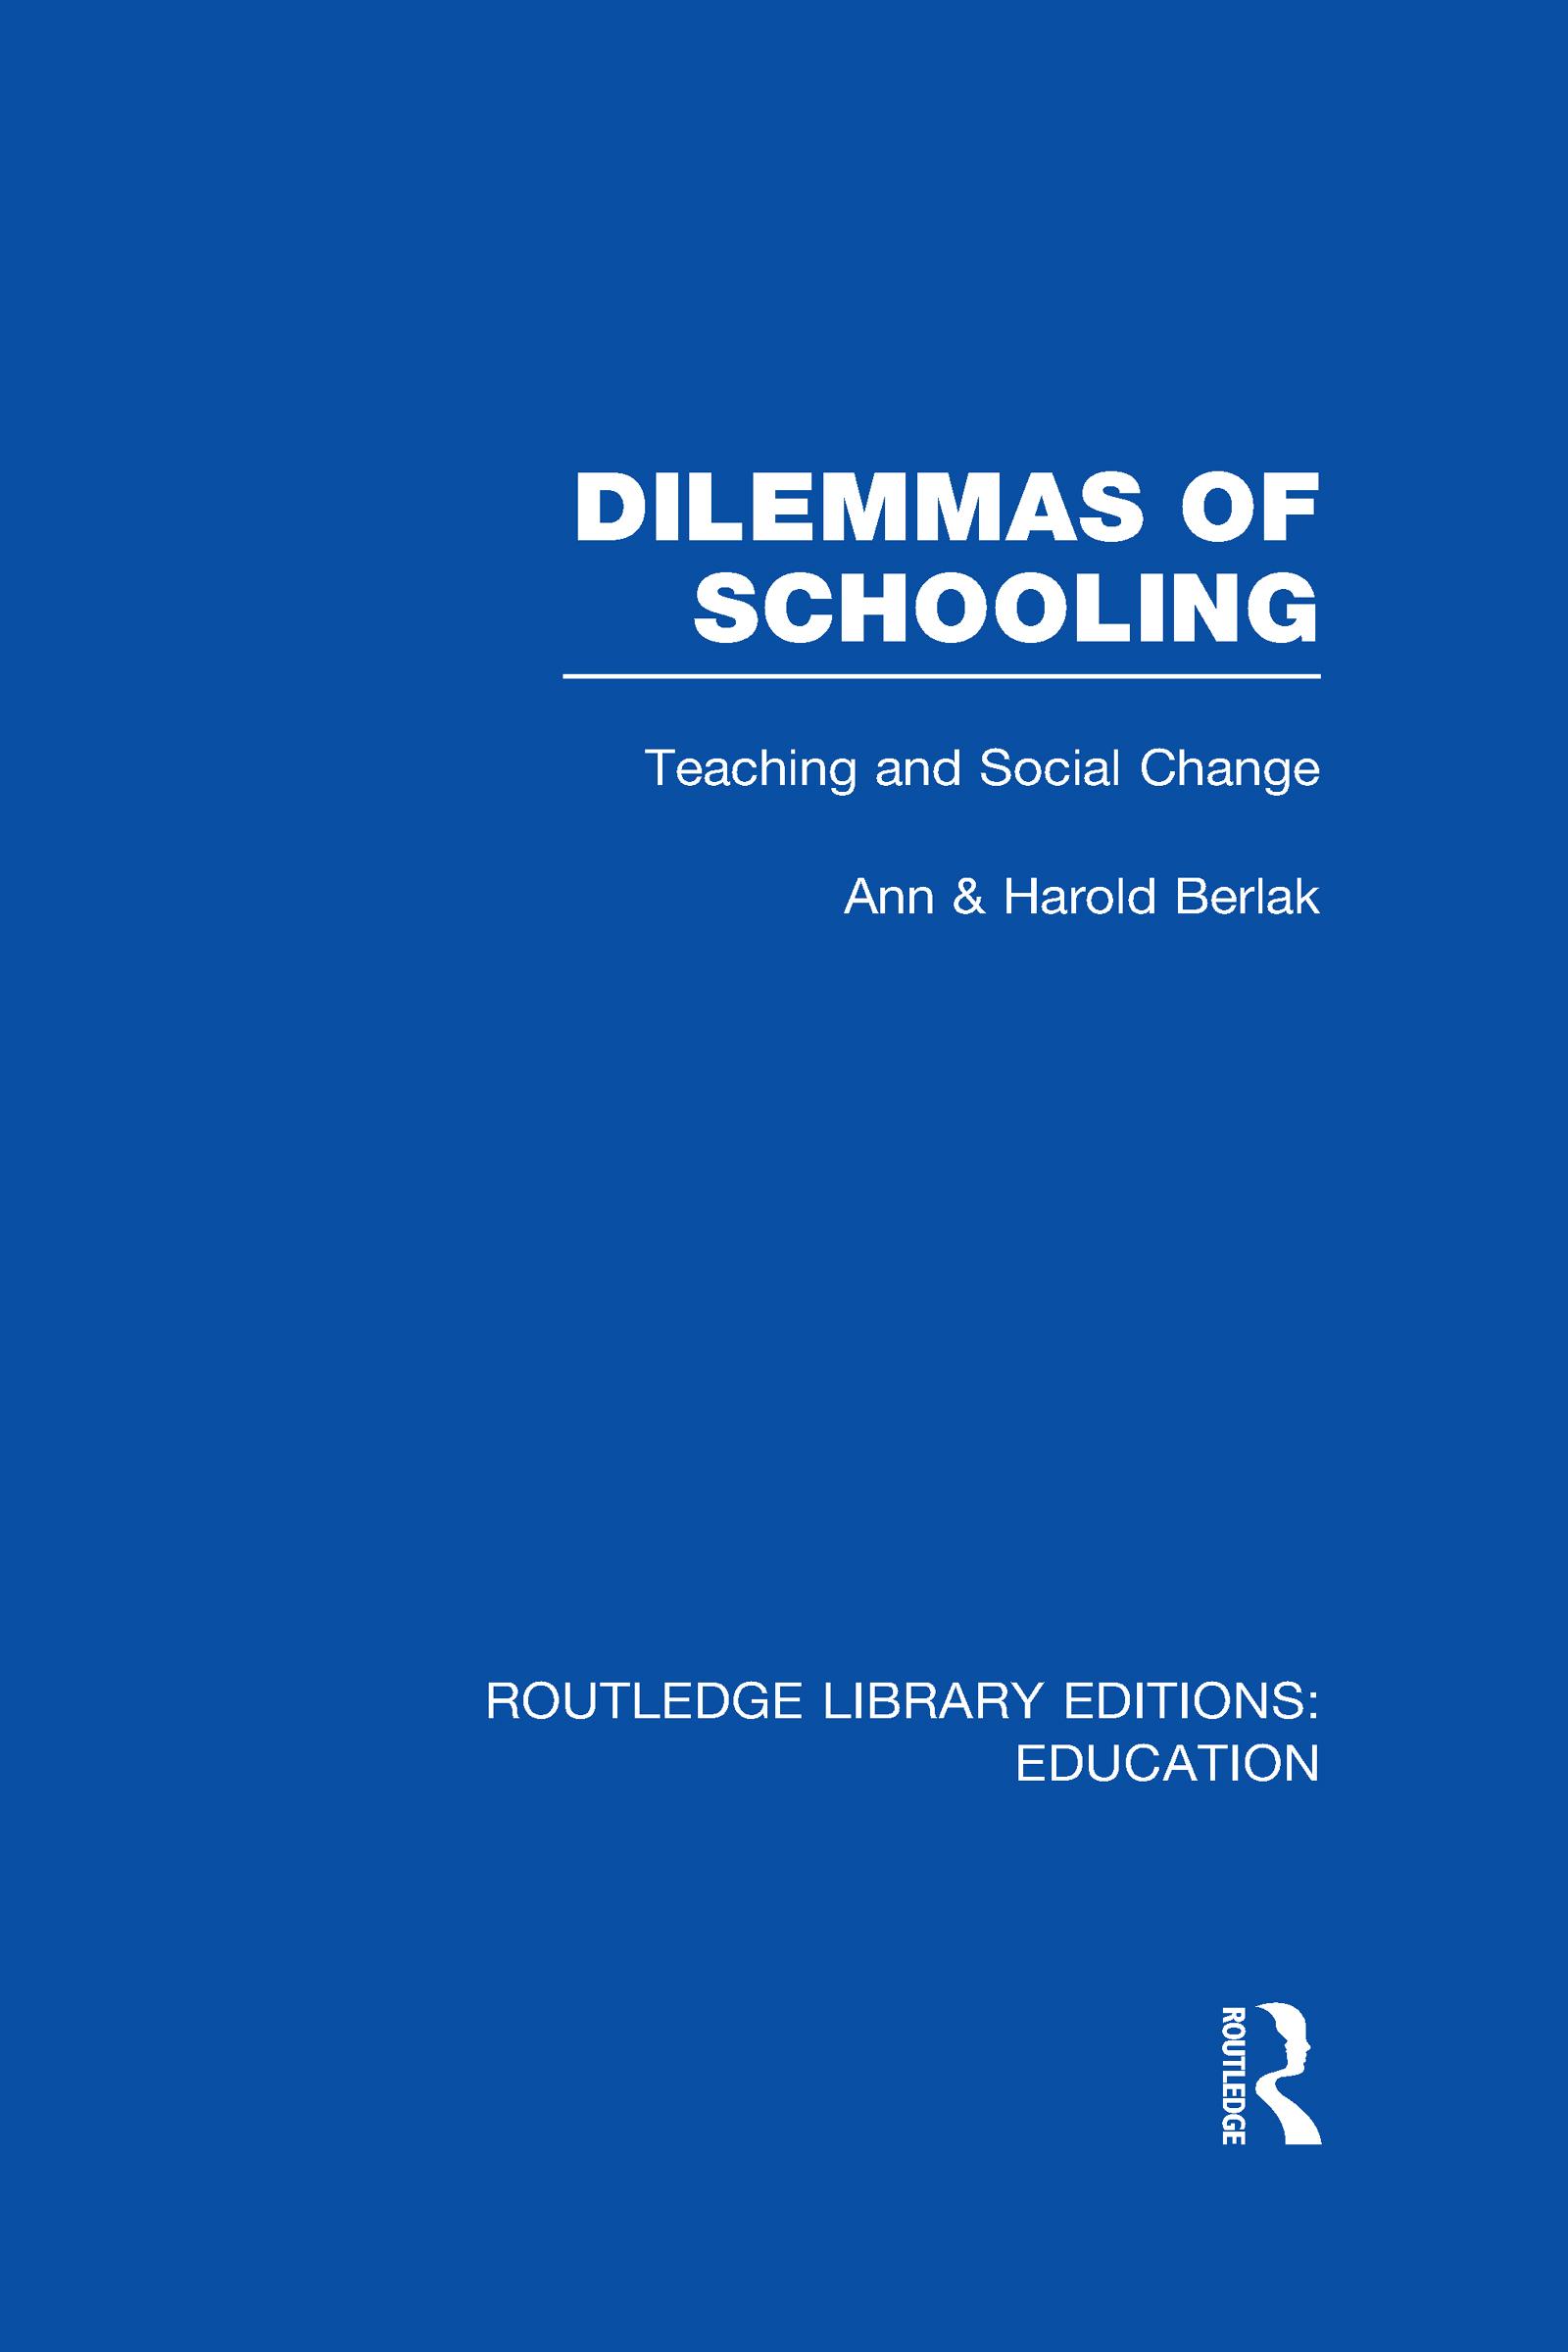 Dilemmas of Schooling (RLE Edu L): Teaching and Social Change (Hardback) book cover